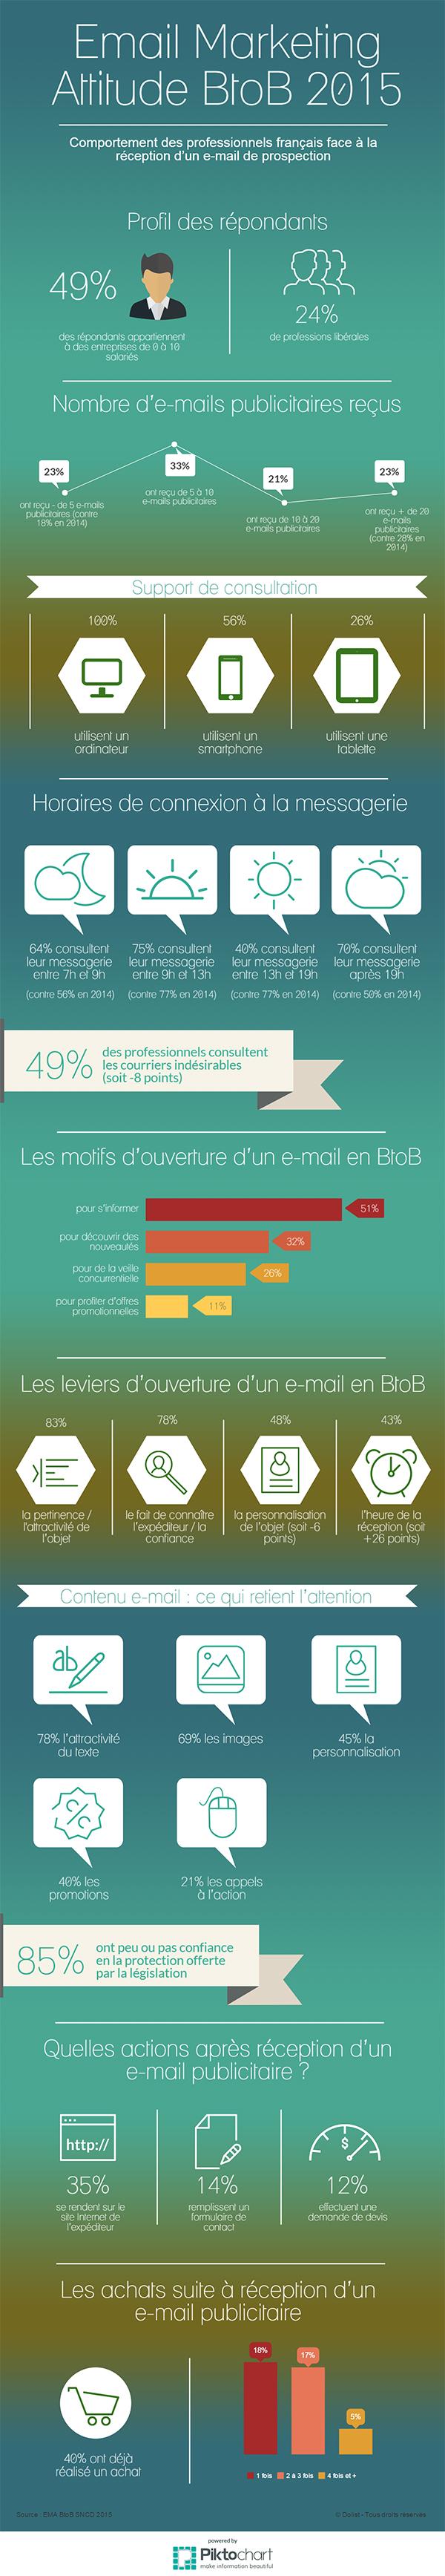 infographie-dolist-ema-btob-sncd-2015